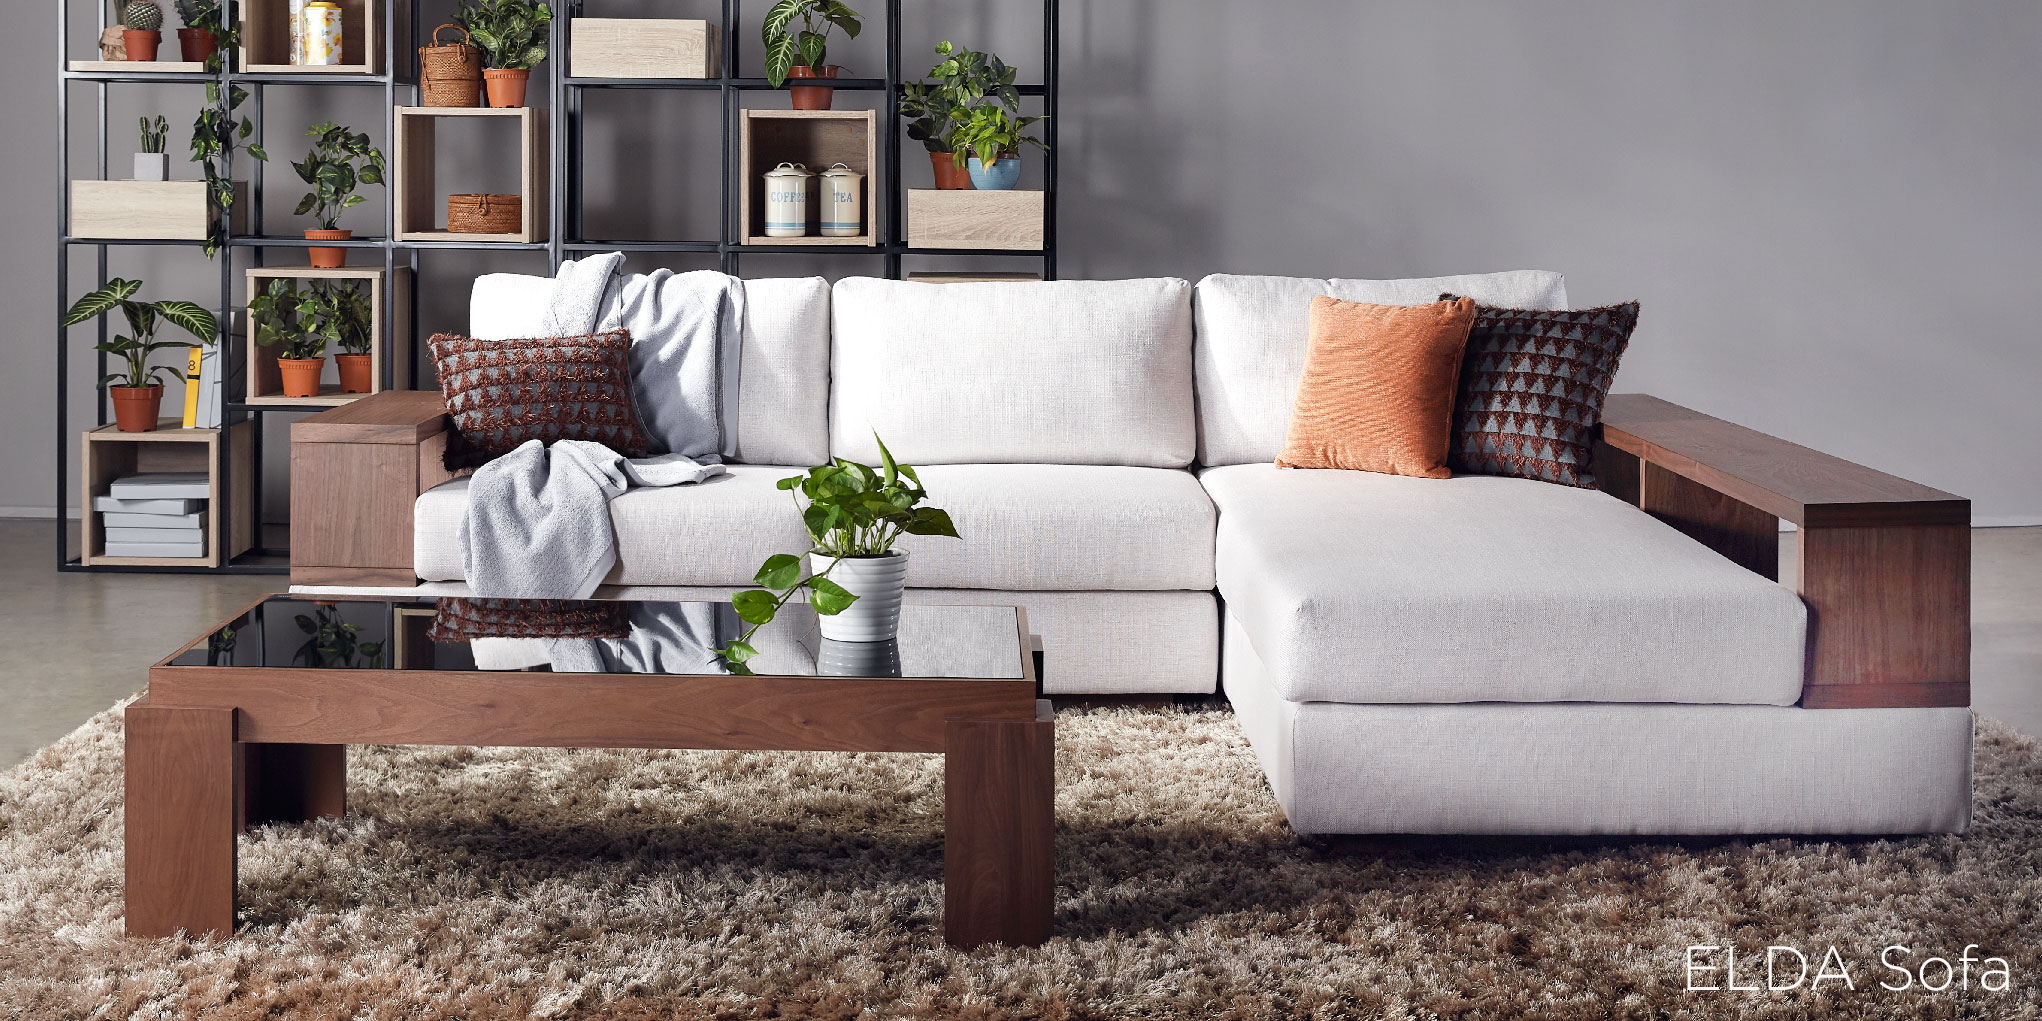 Elda sofa 01 01